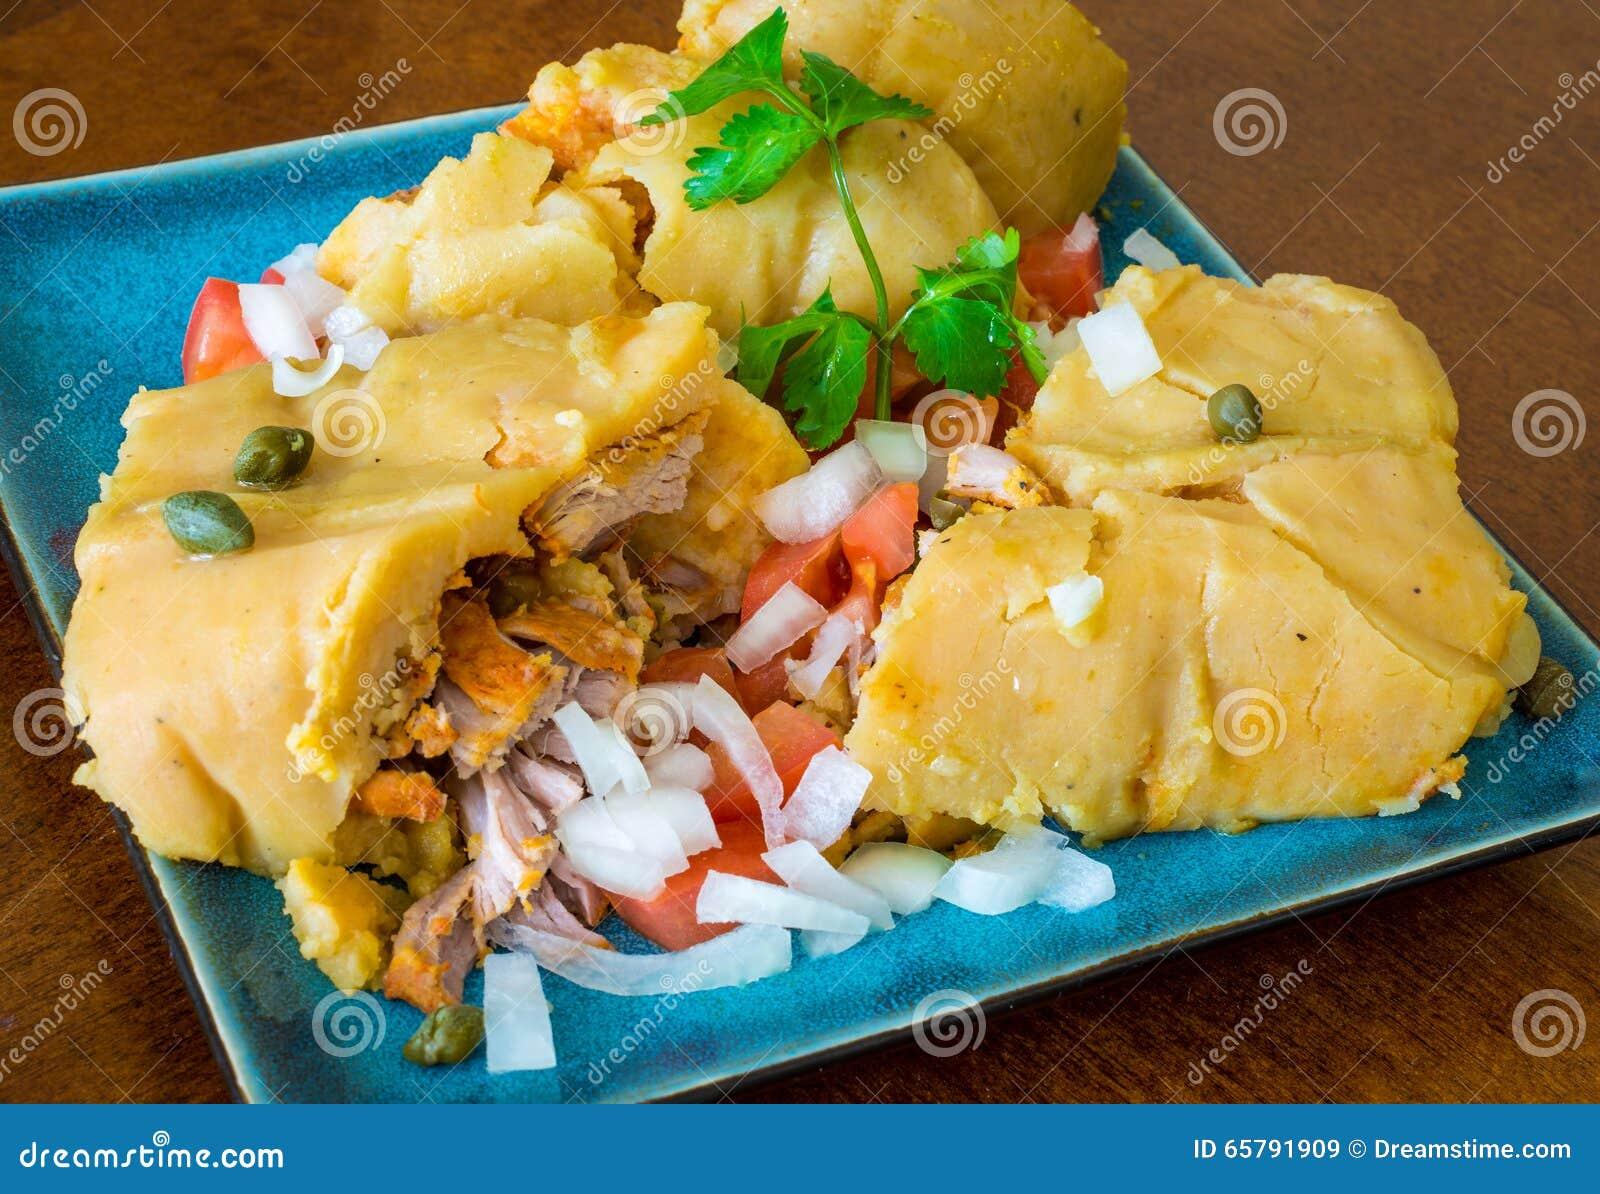 Nacatamal or tamal, a dish from Latin America